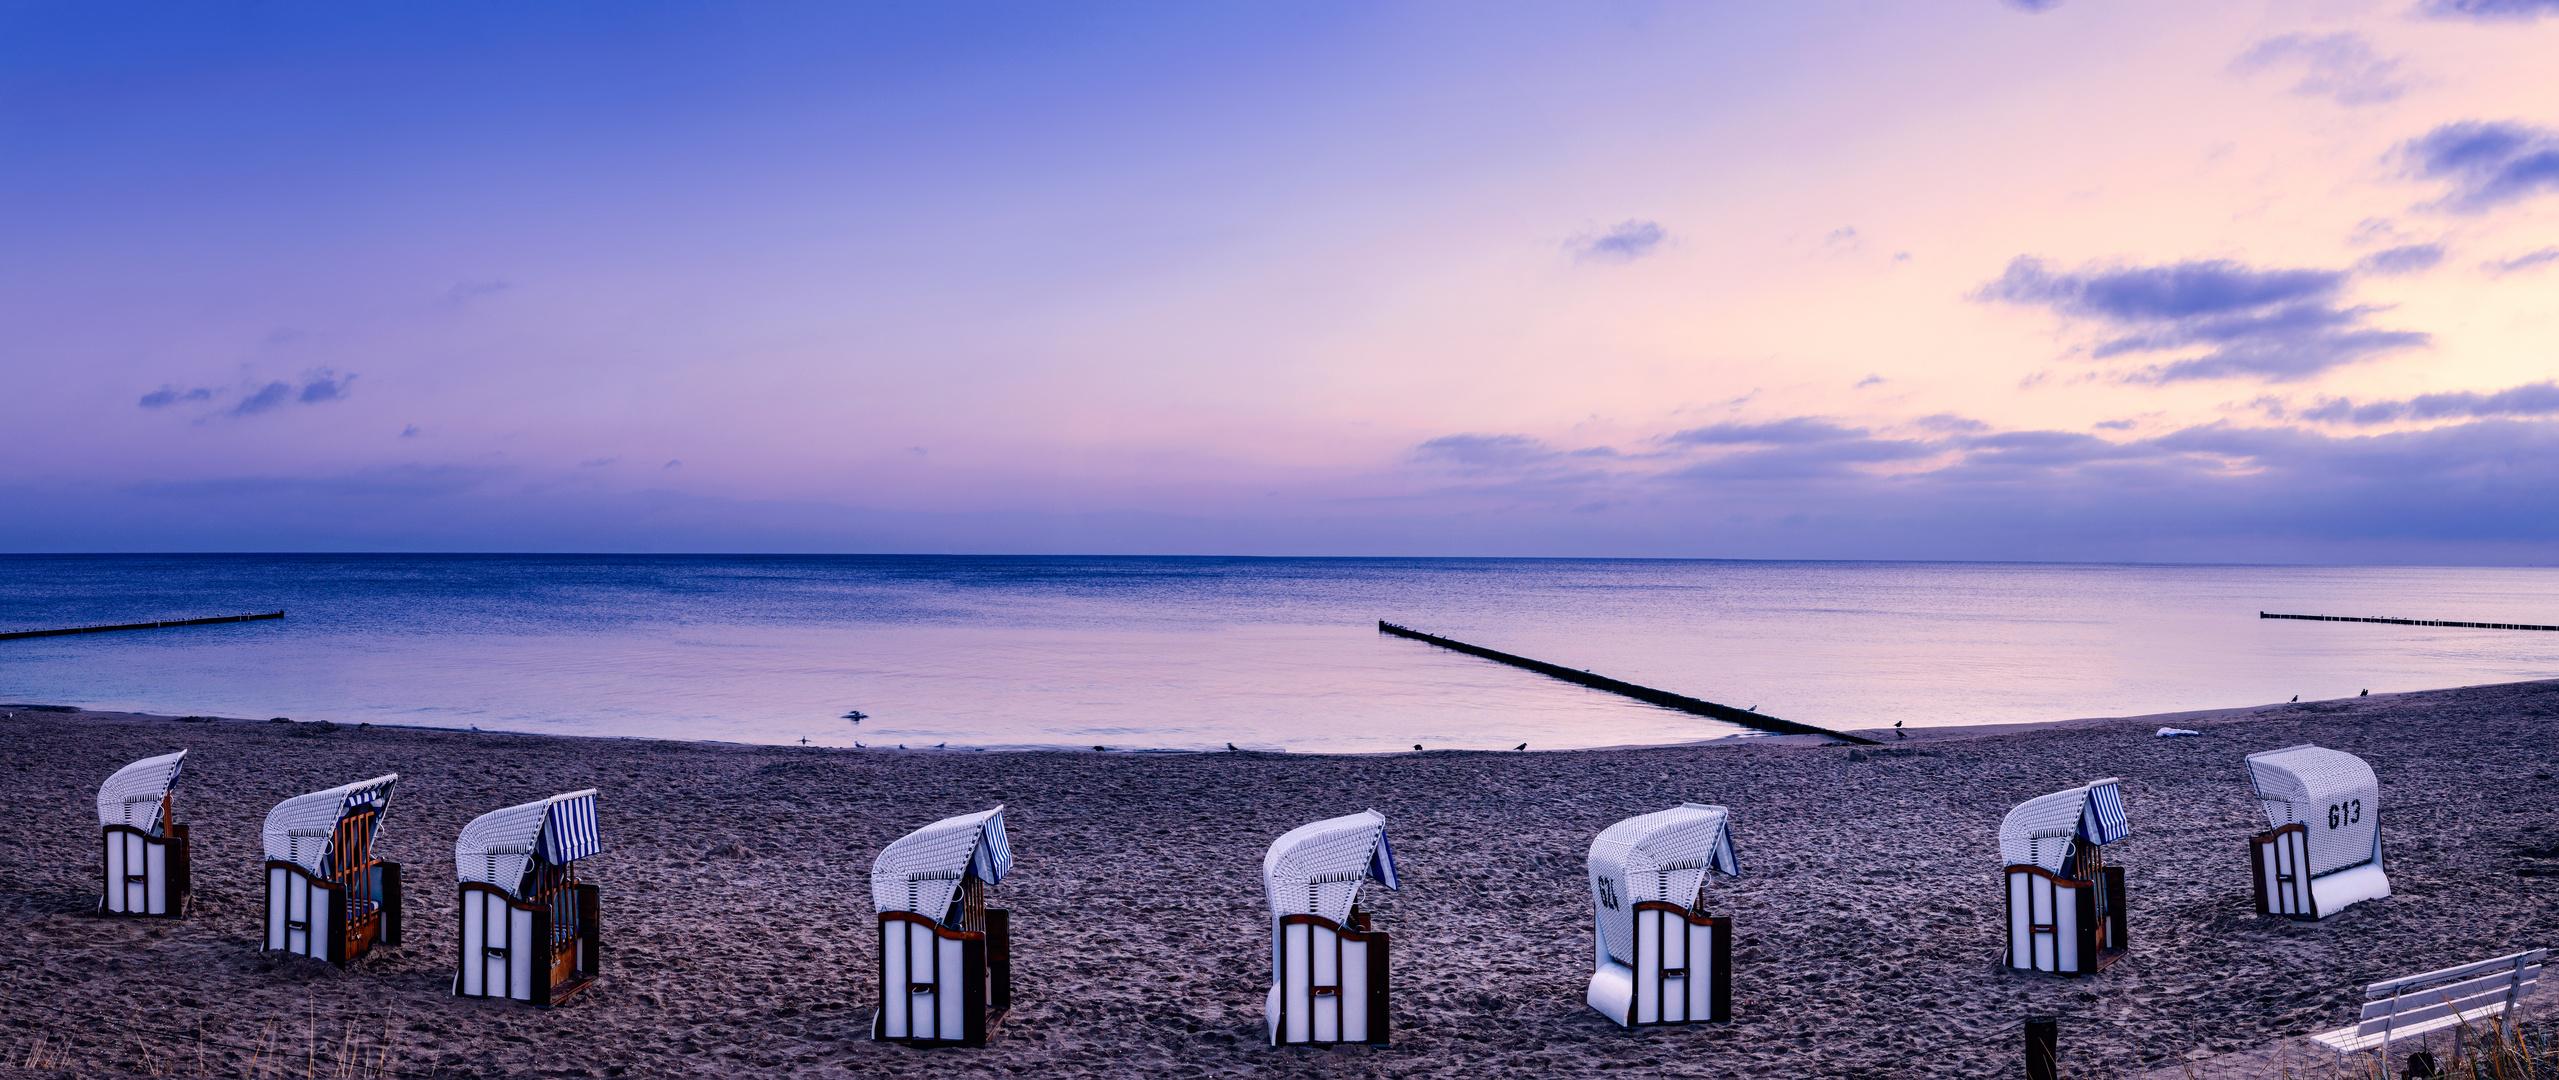 Beach Chairs on Usedom